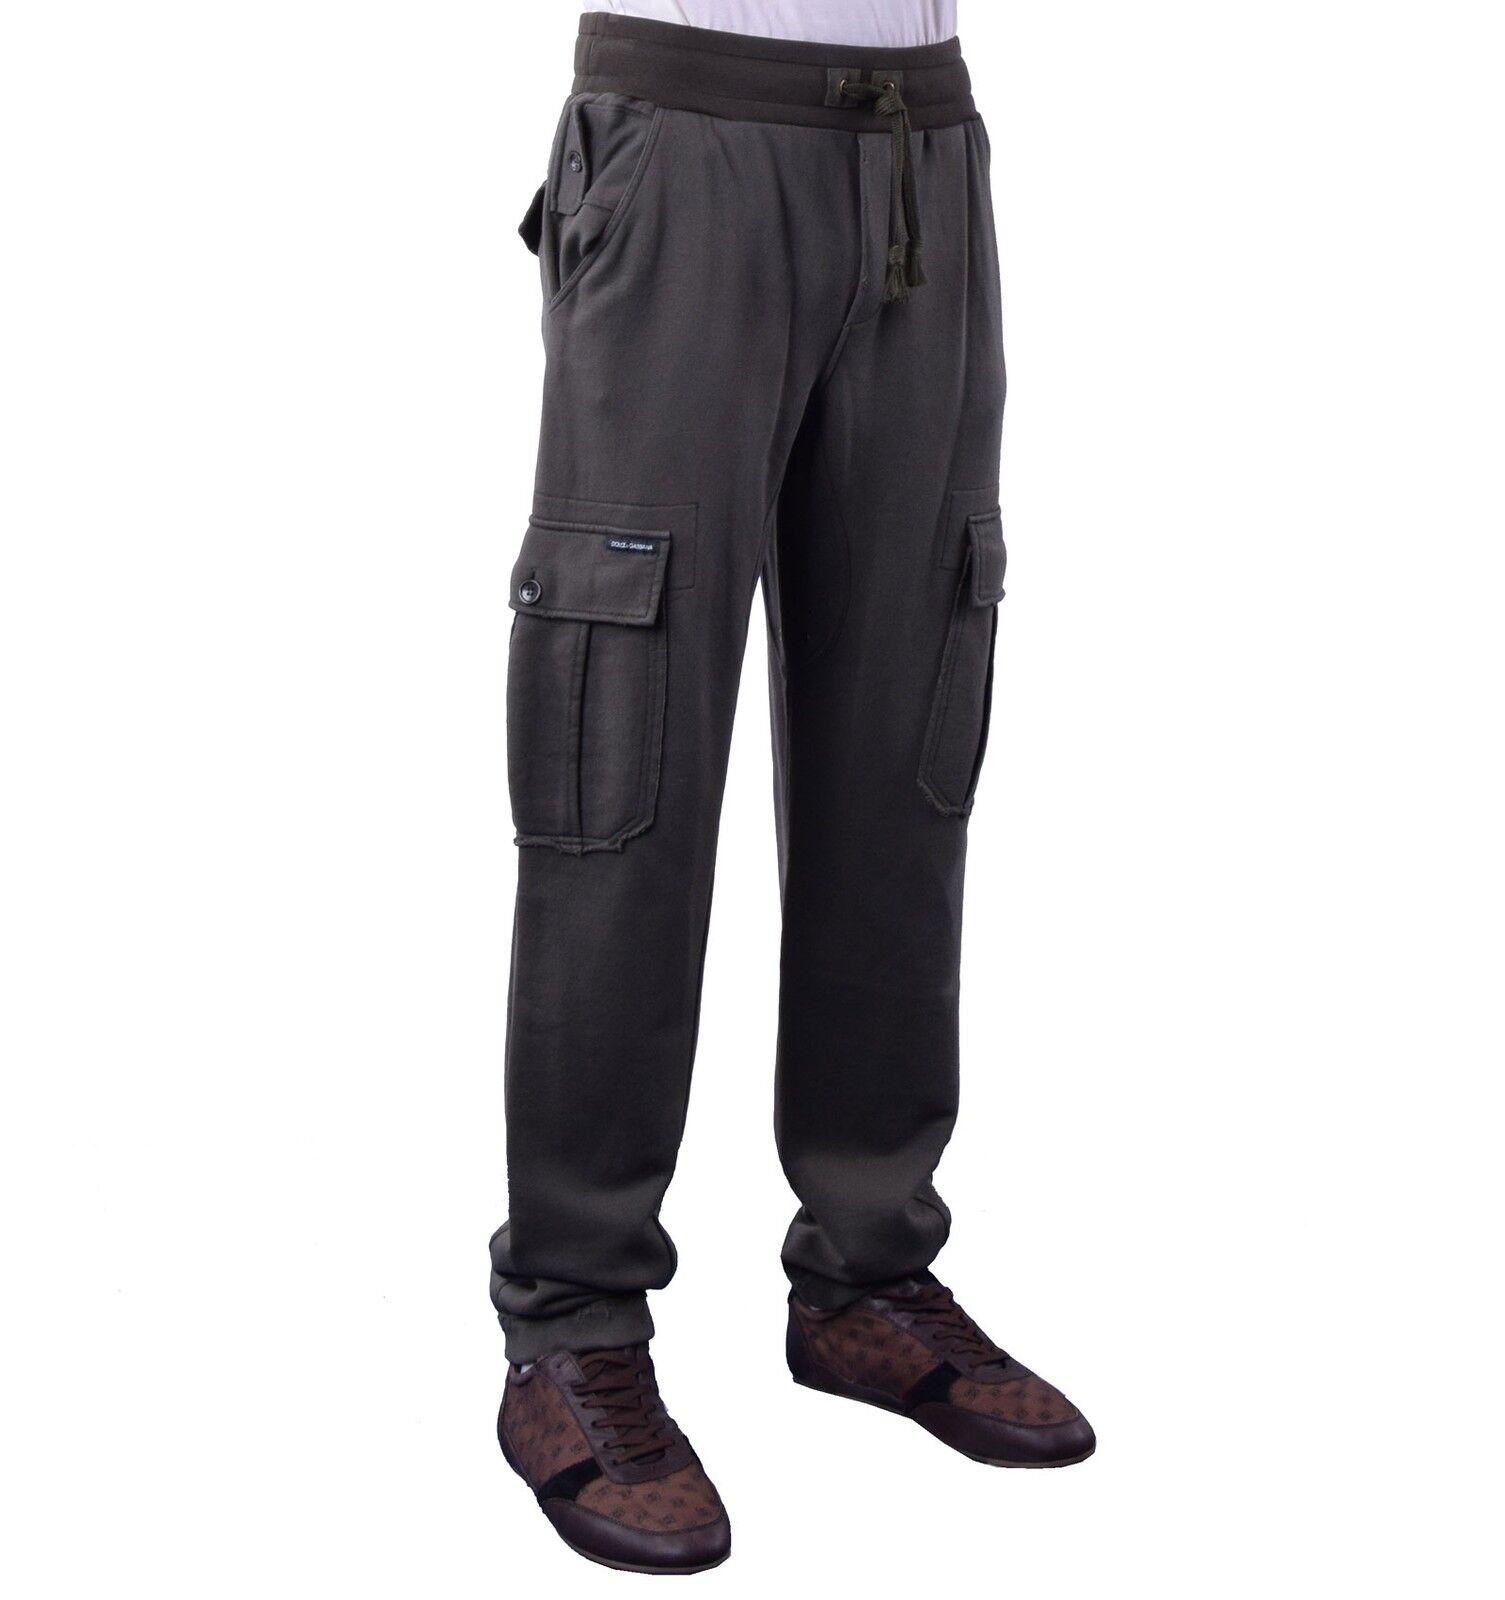 DOLCE & GABBANA Sporthose Fitness Hose im Militär-Stil Khaki Sport Trousers 0412